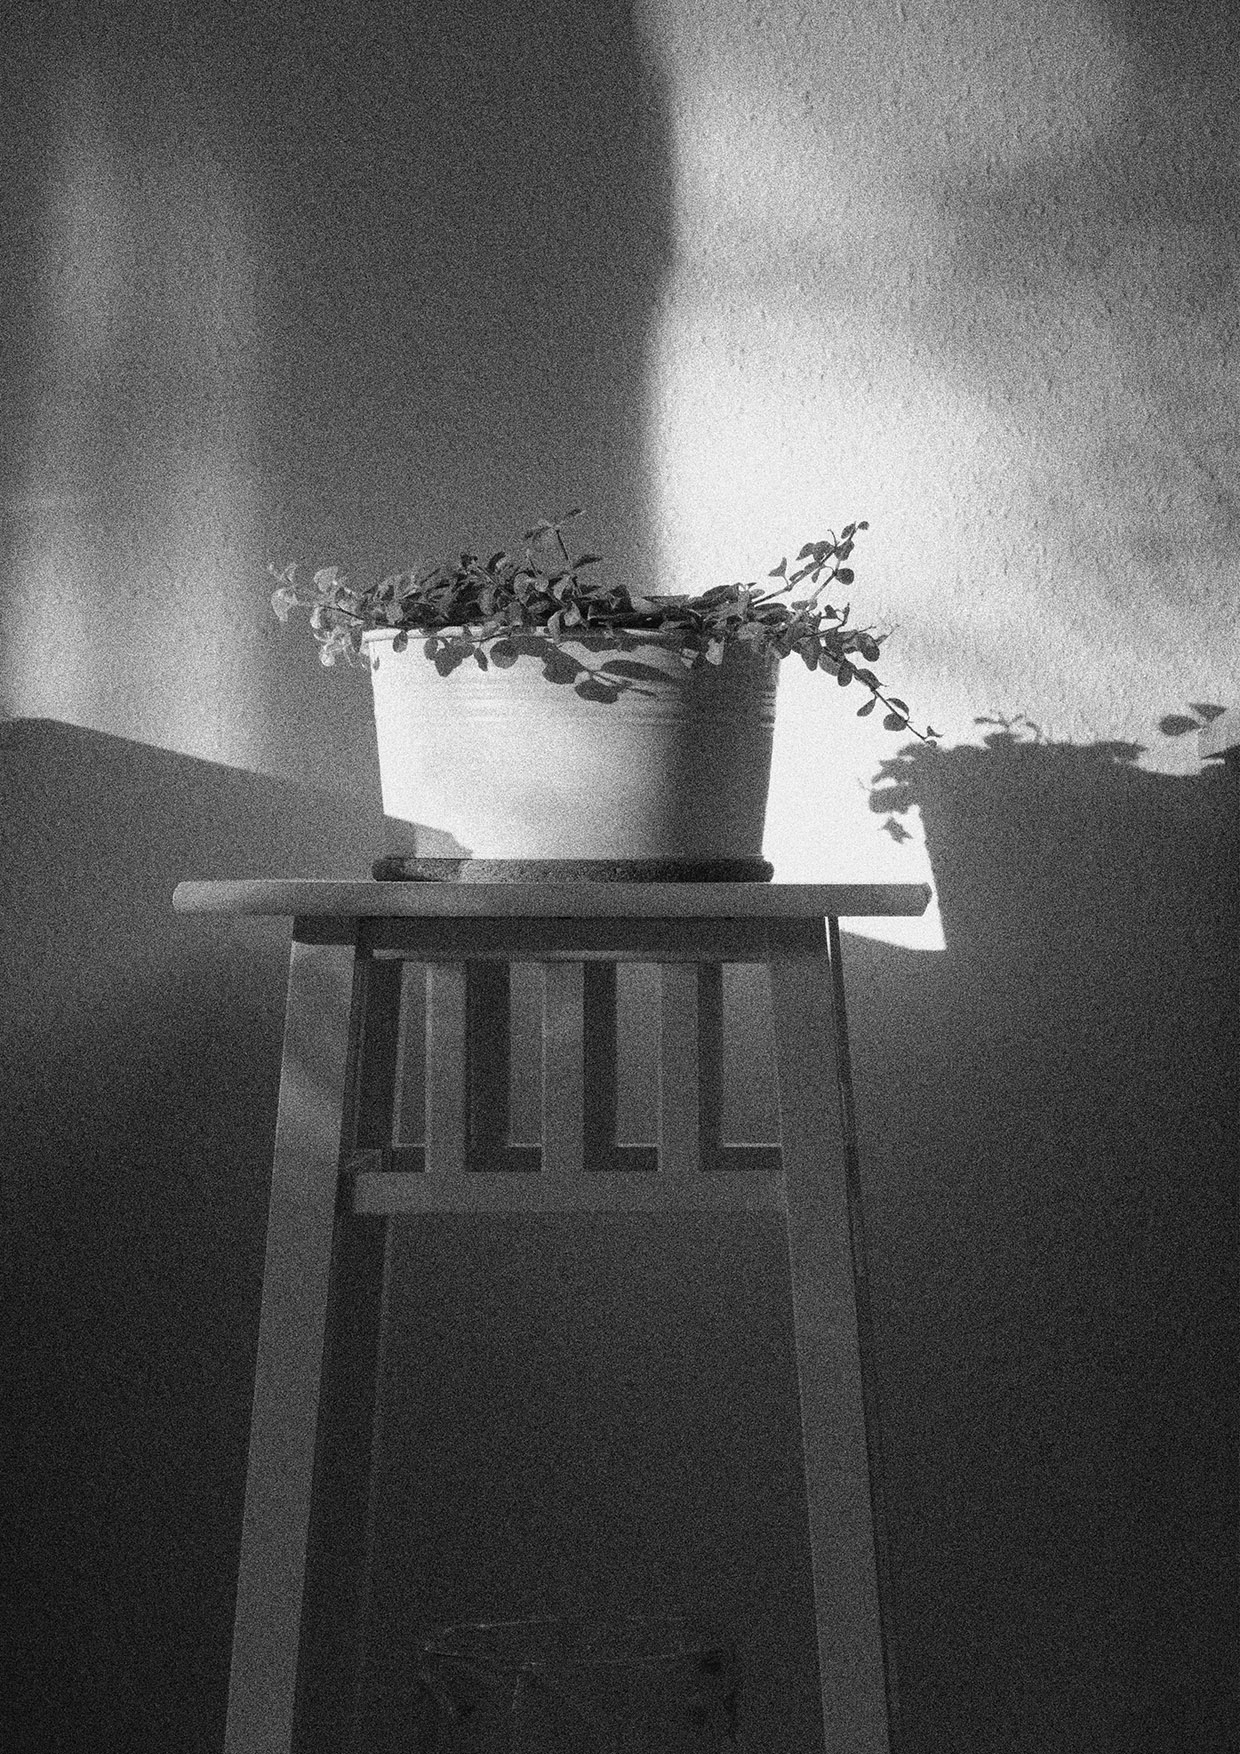 protasiuk - The Narrow Daylight 1